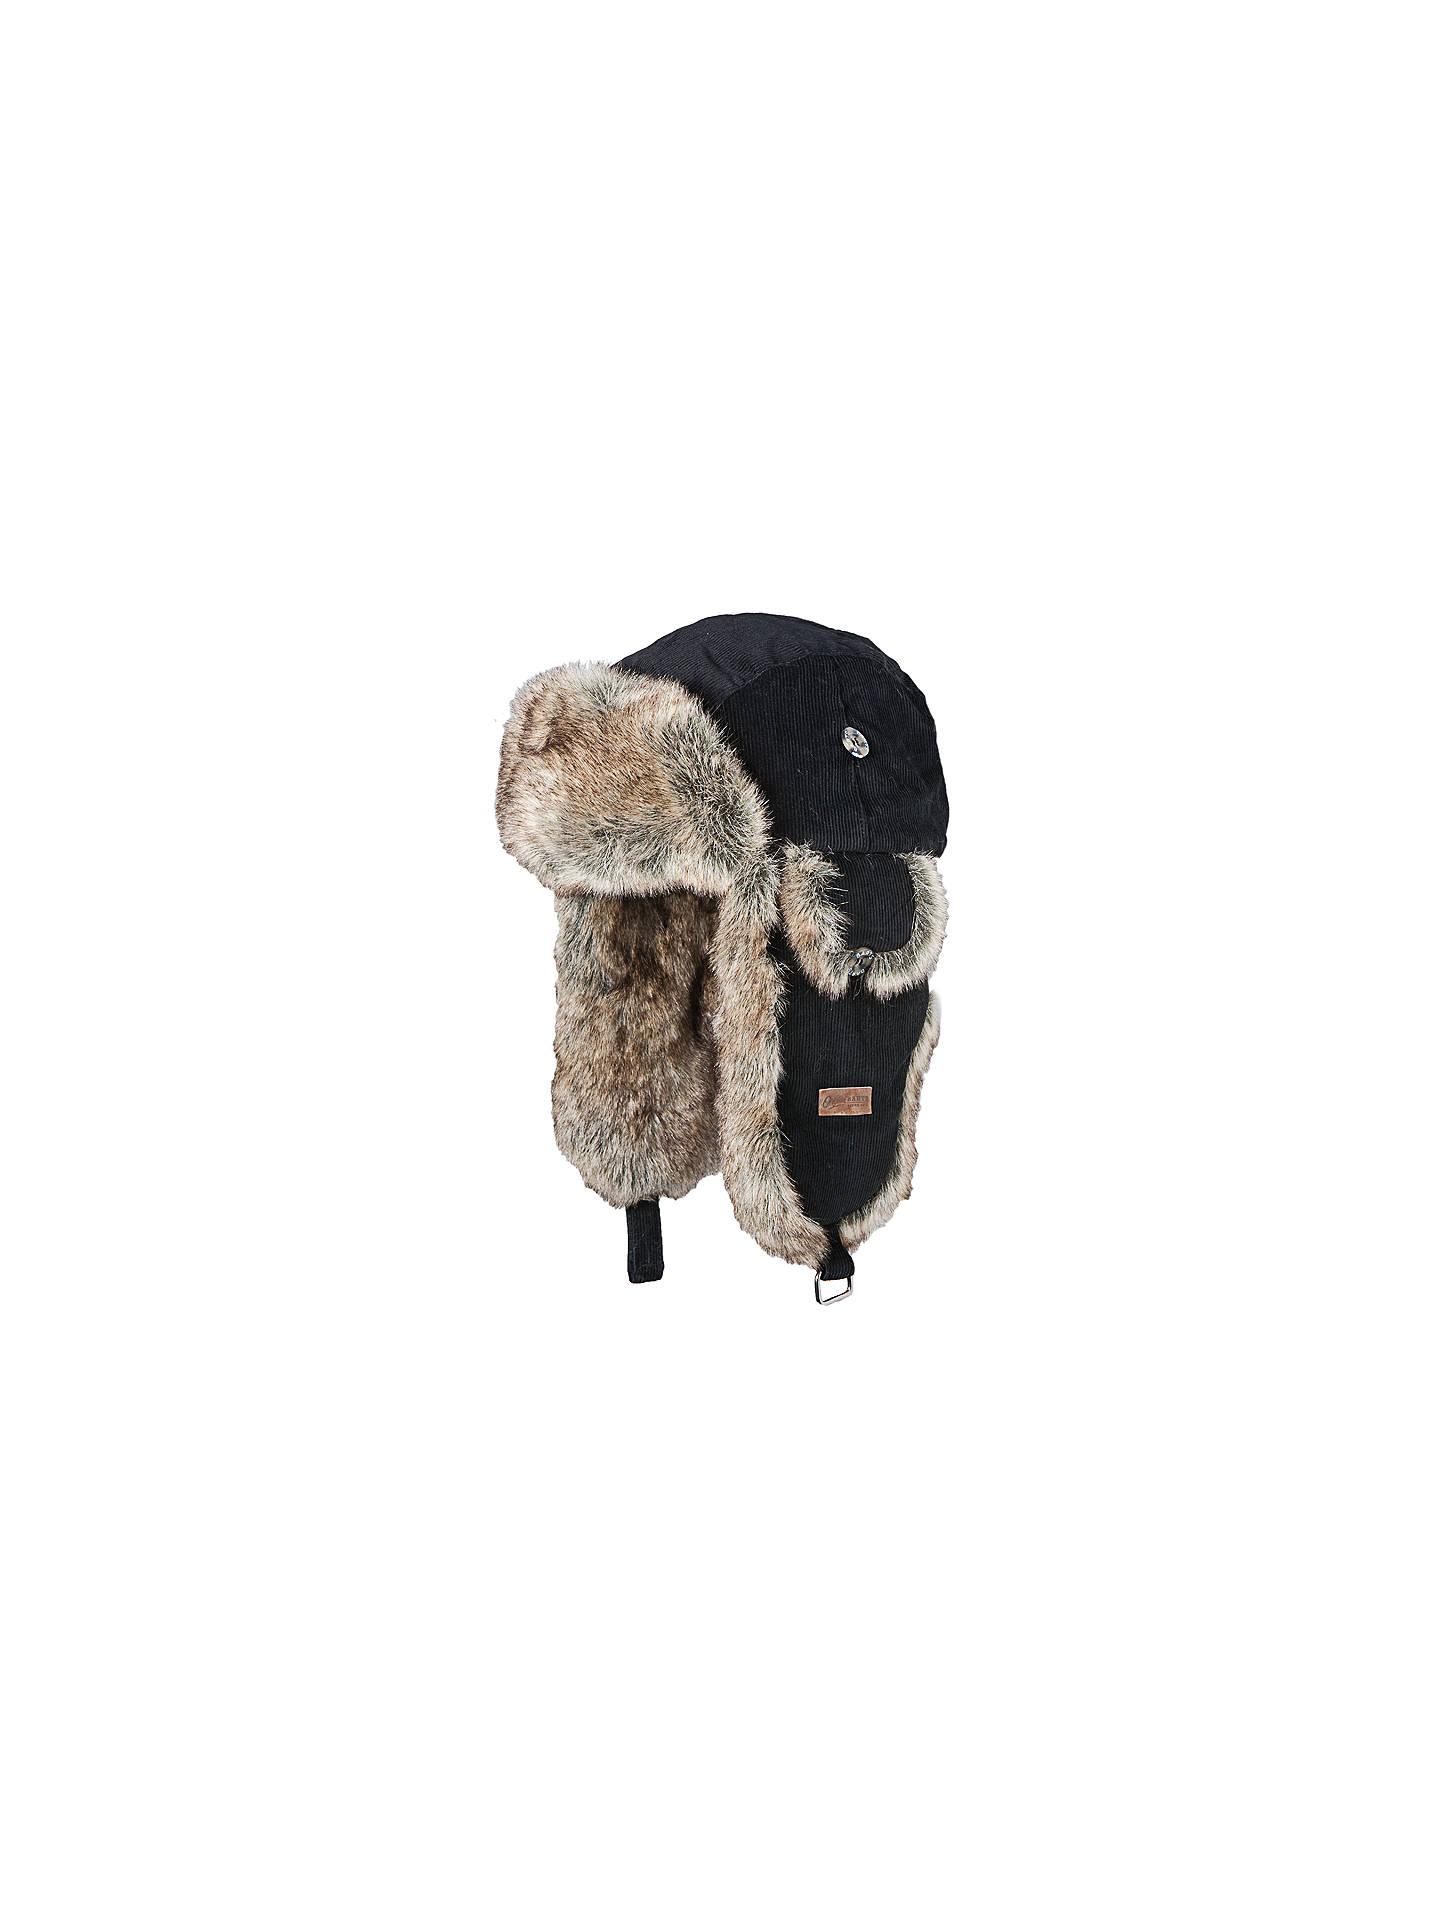 5ea2a5bb8c6 Buy Barts Faux Fur Rib Bomber Trapper Hat